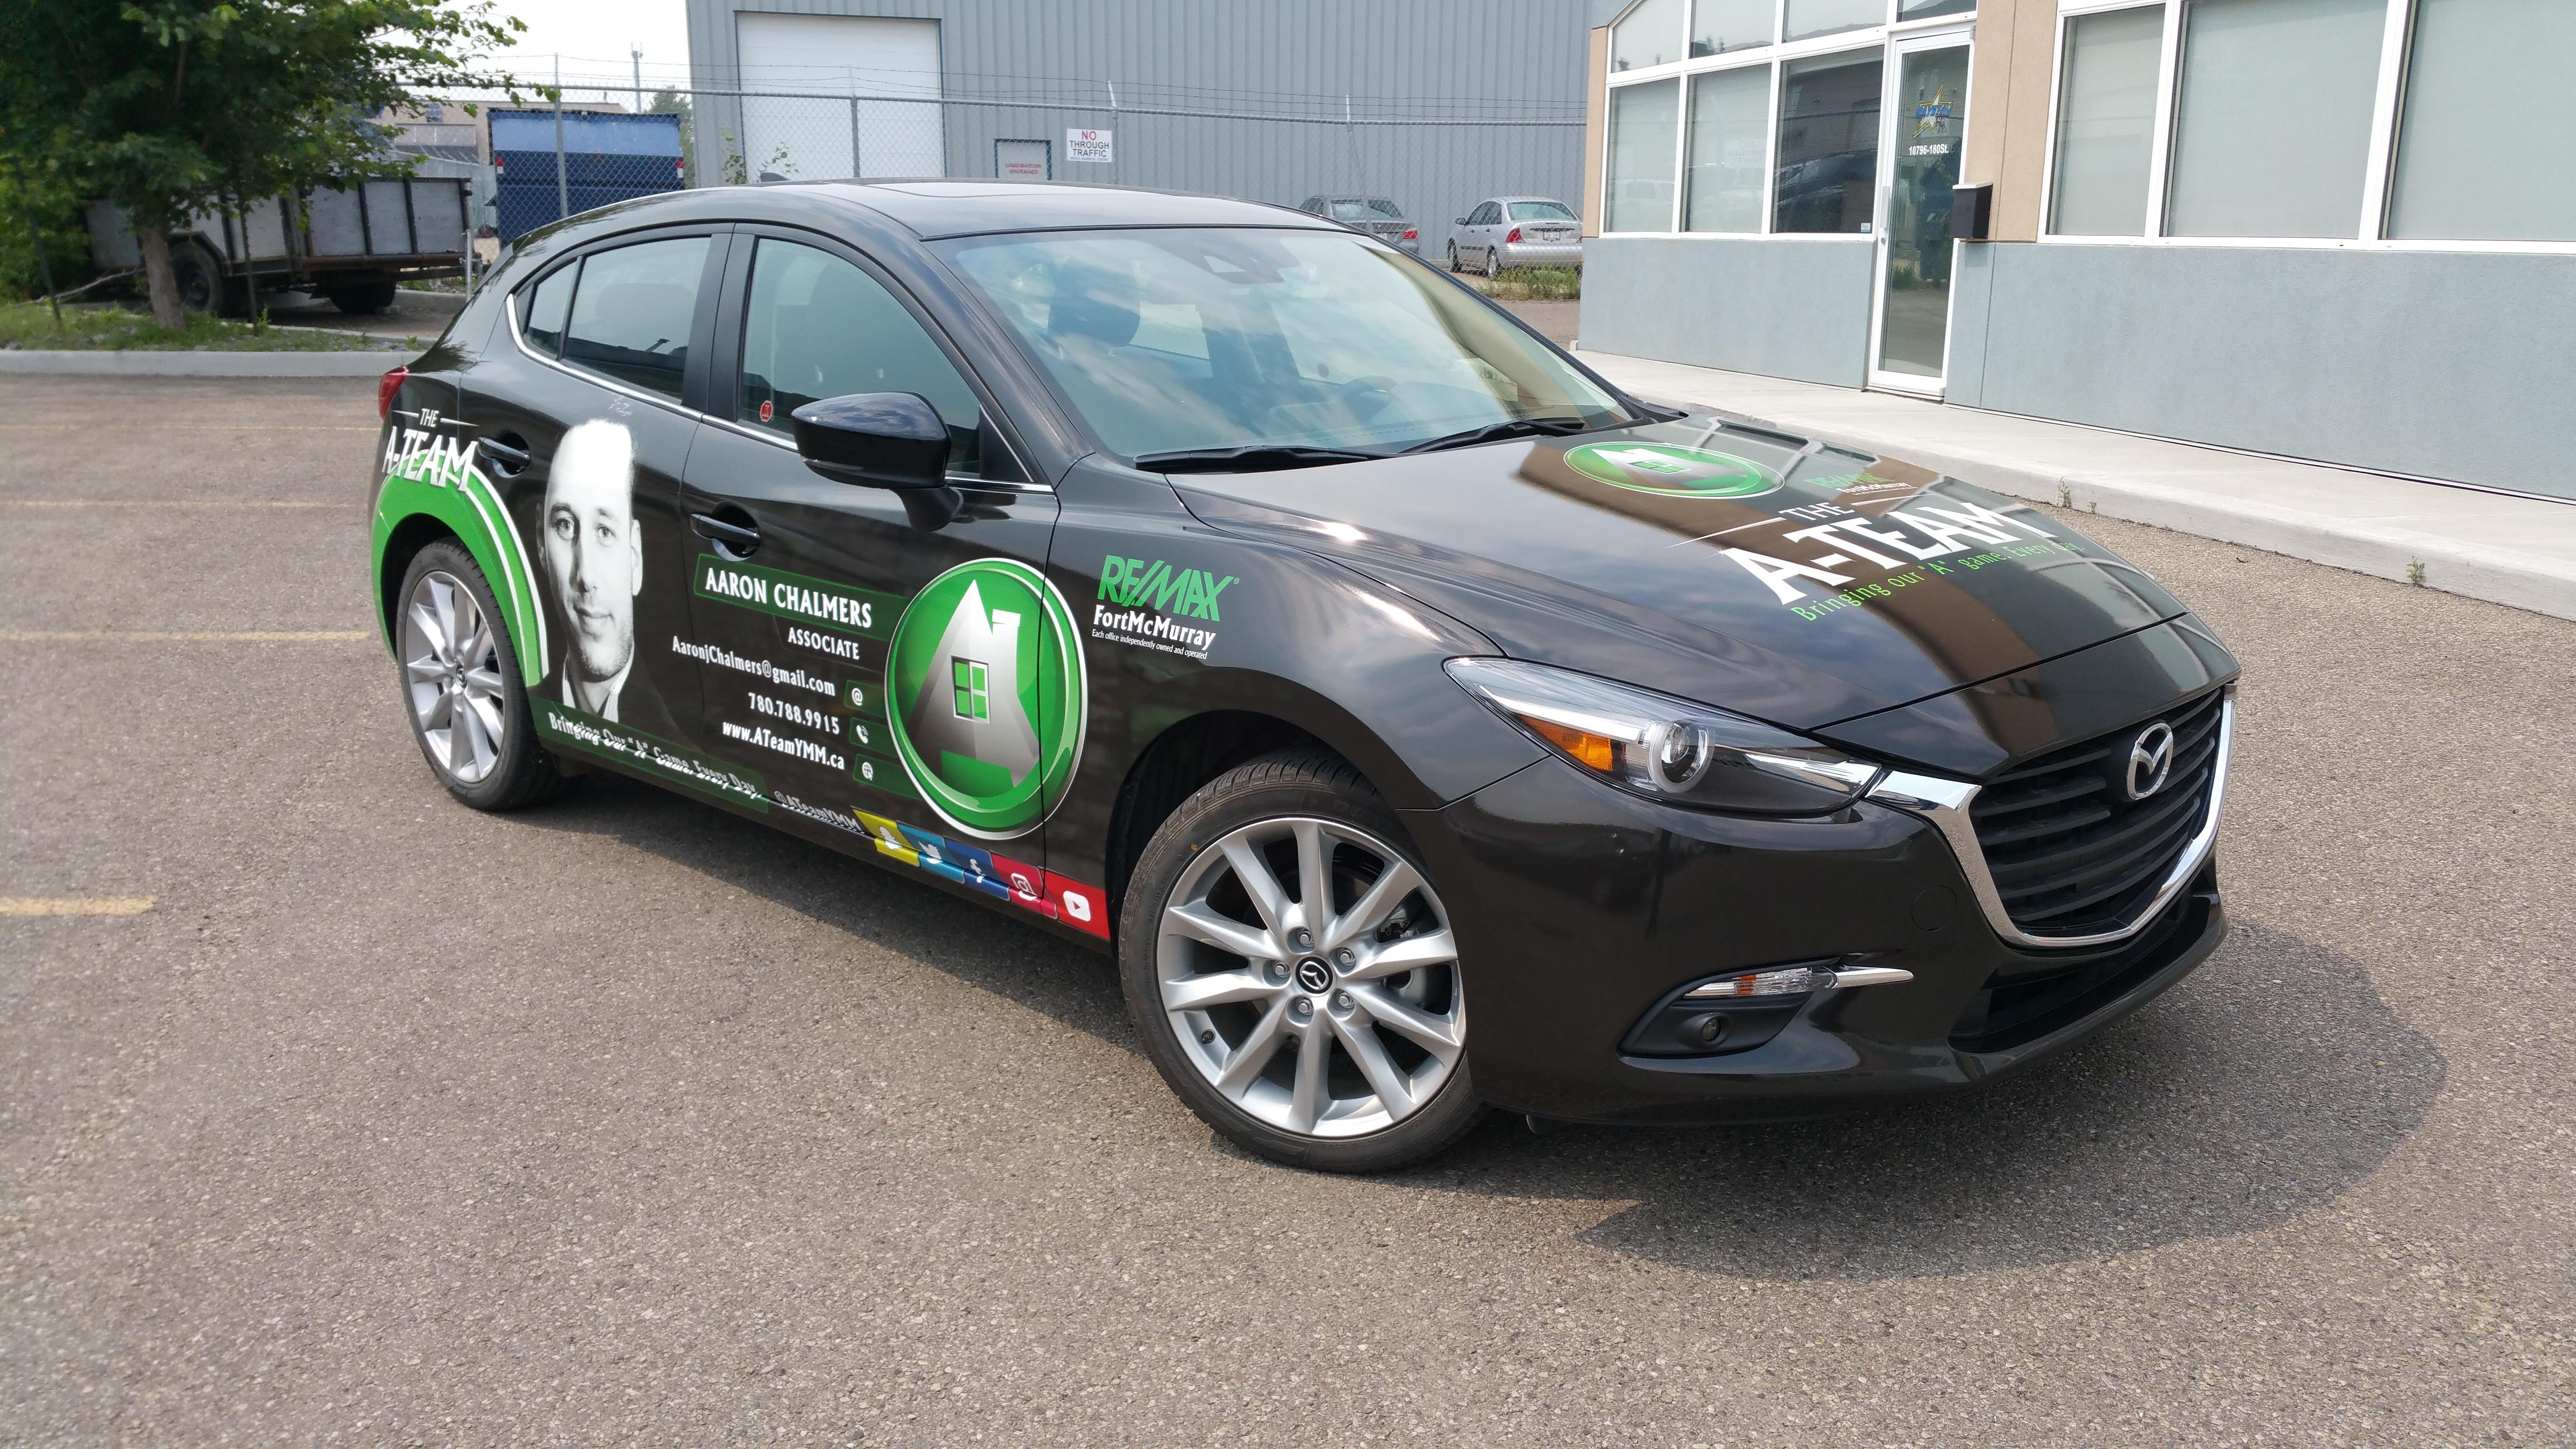 The A Team Mazda